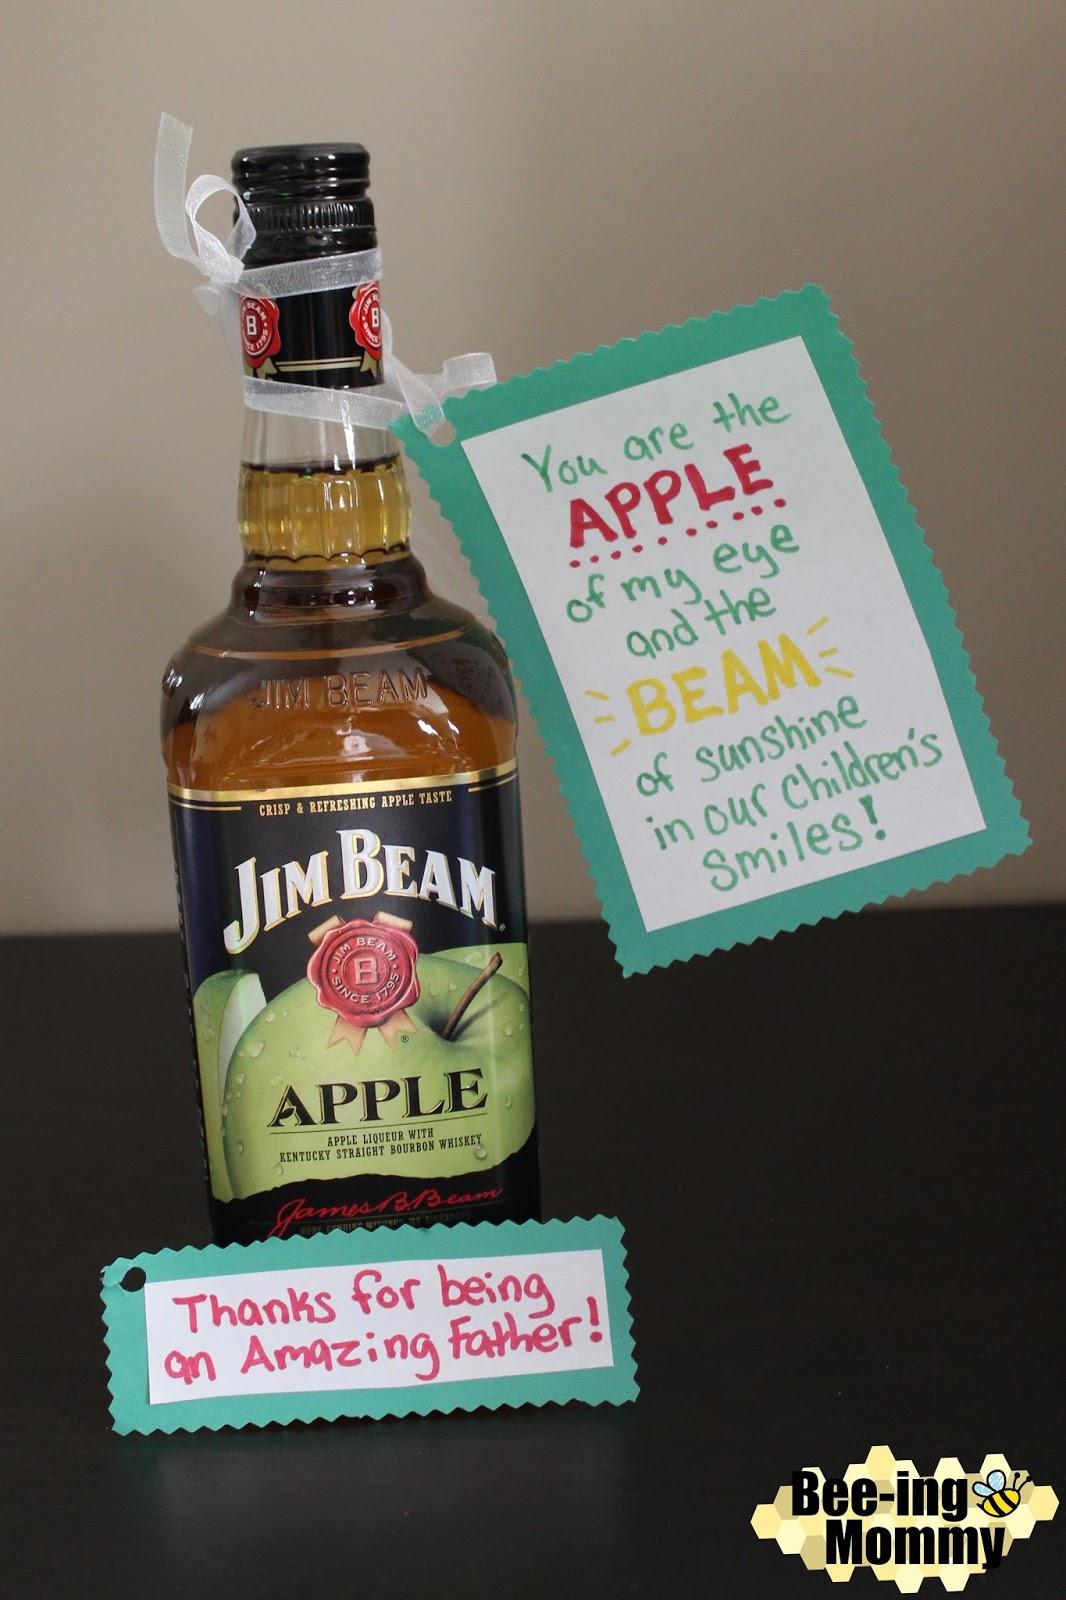 Jim Beam Apple, Jim Beam Apple Gift and Saying, Jim Beam Apple Gift,